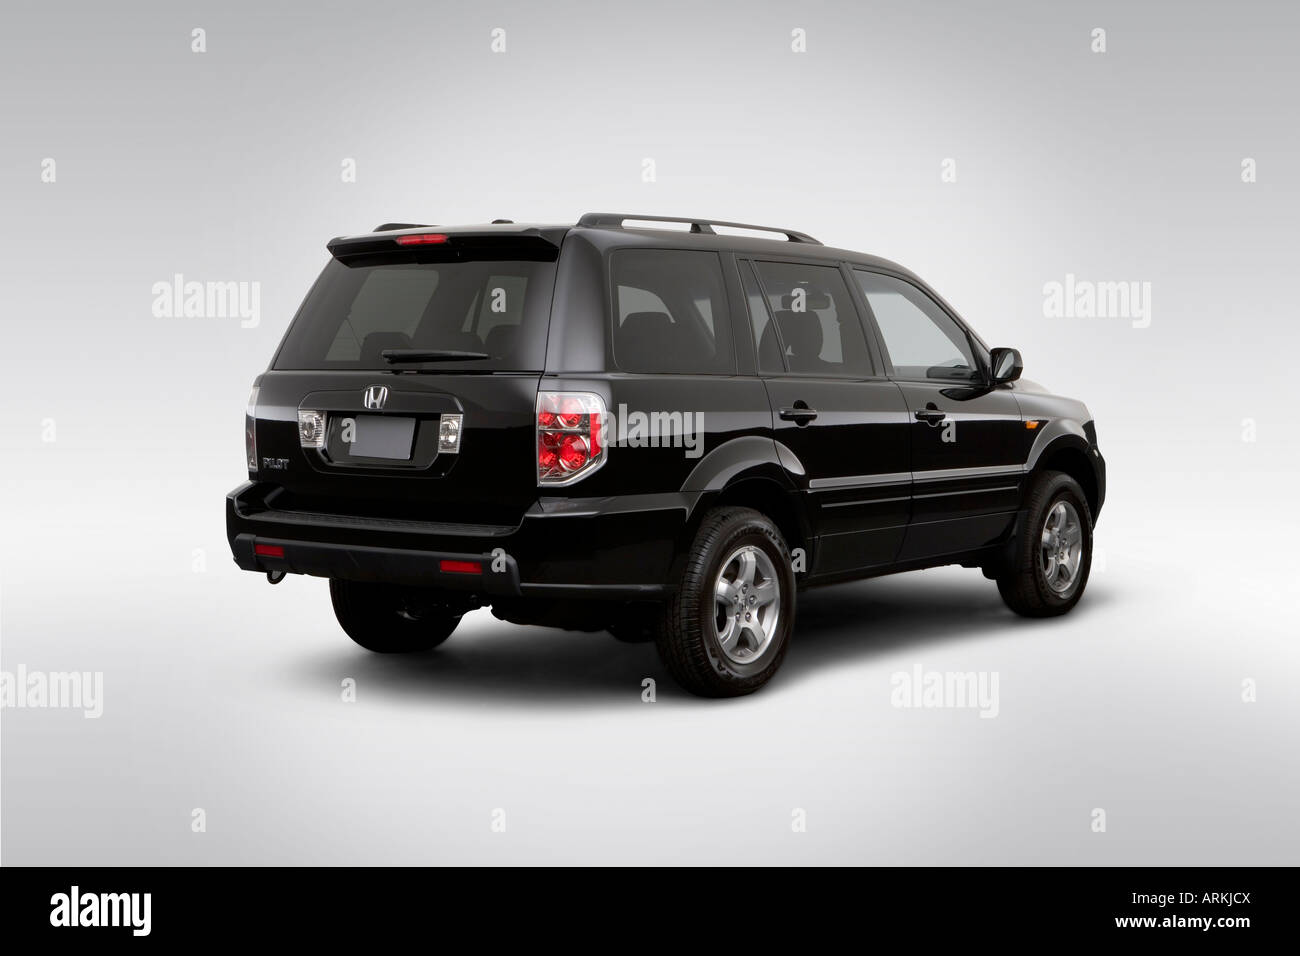 Honda Pilot Towing Capacity >> 2008 Honda Pilot EX-L in Black - Rear angle view Stock Photo: 16078201 - Alamy